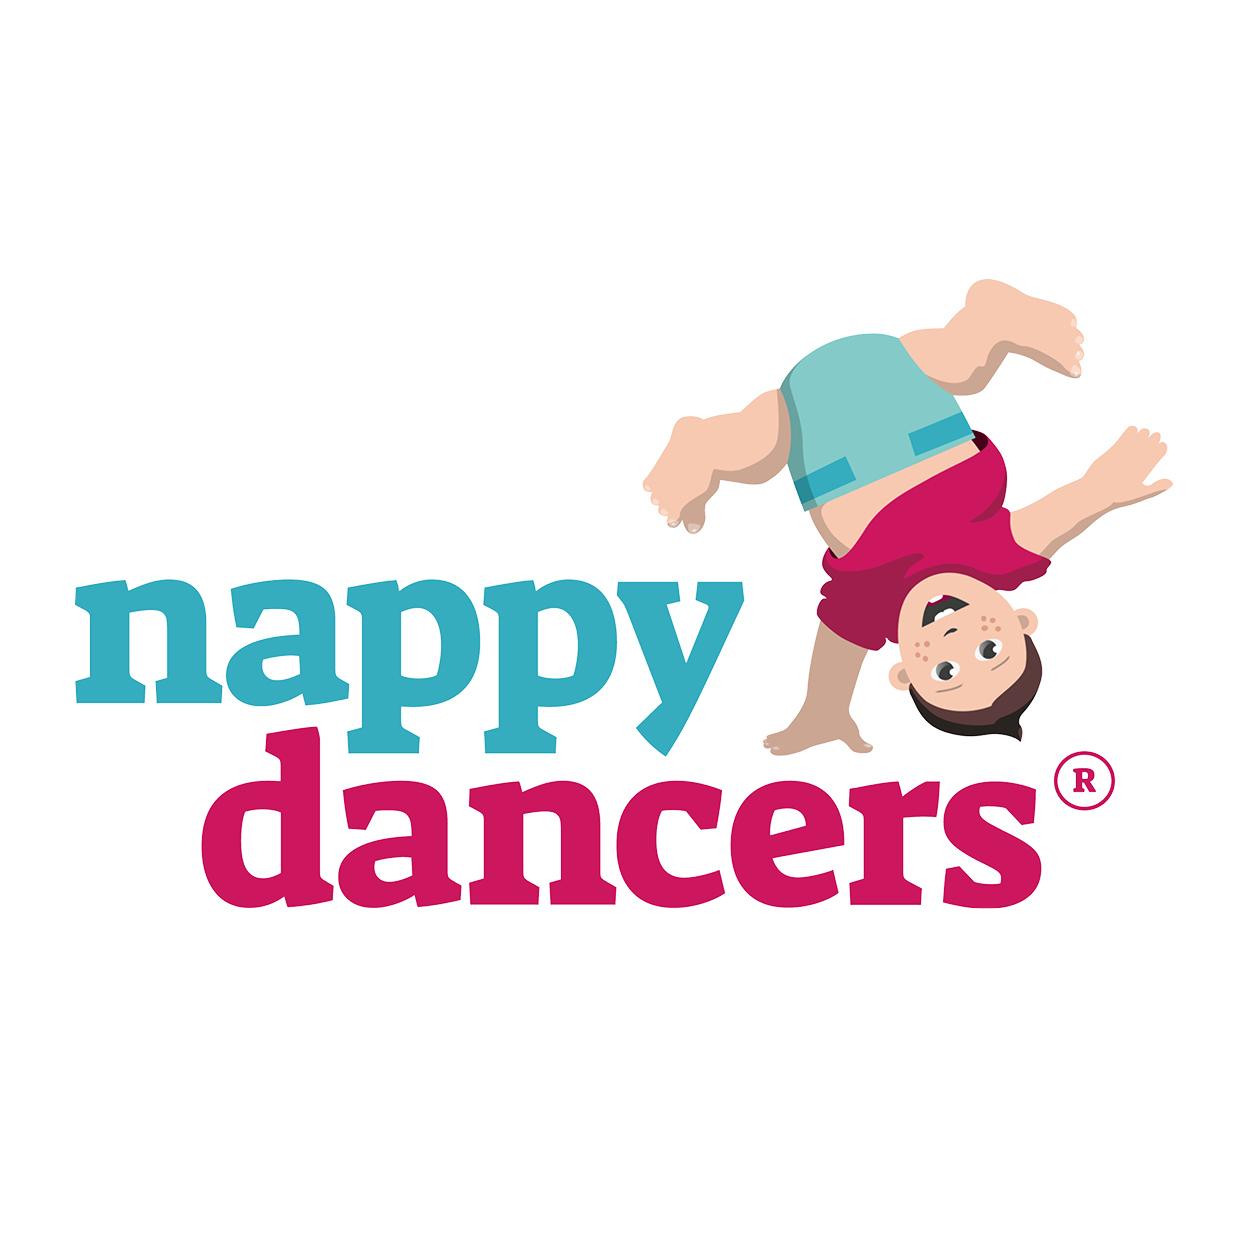 nappydancers®